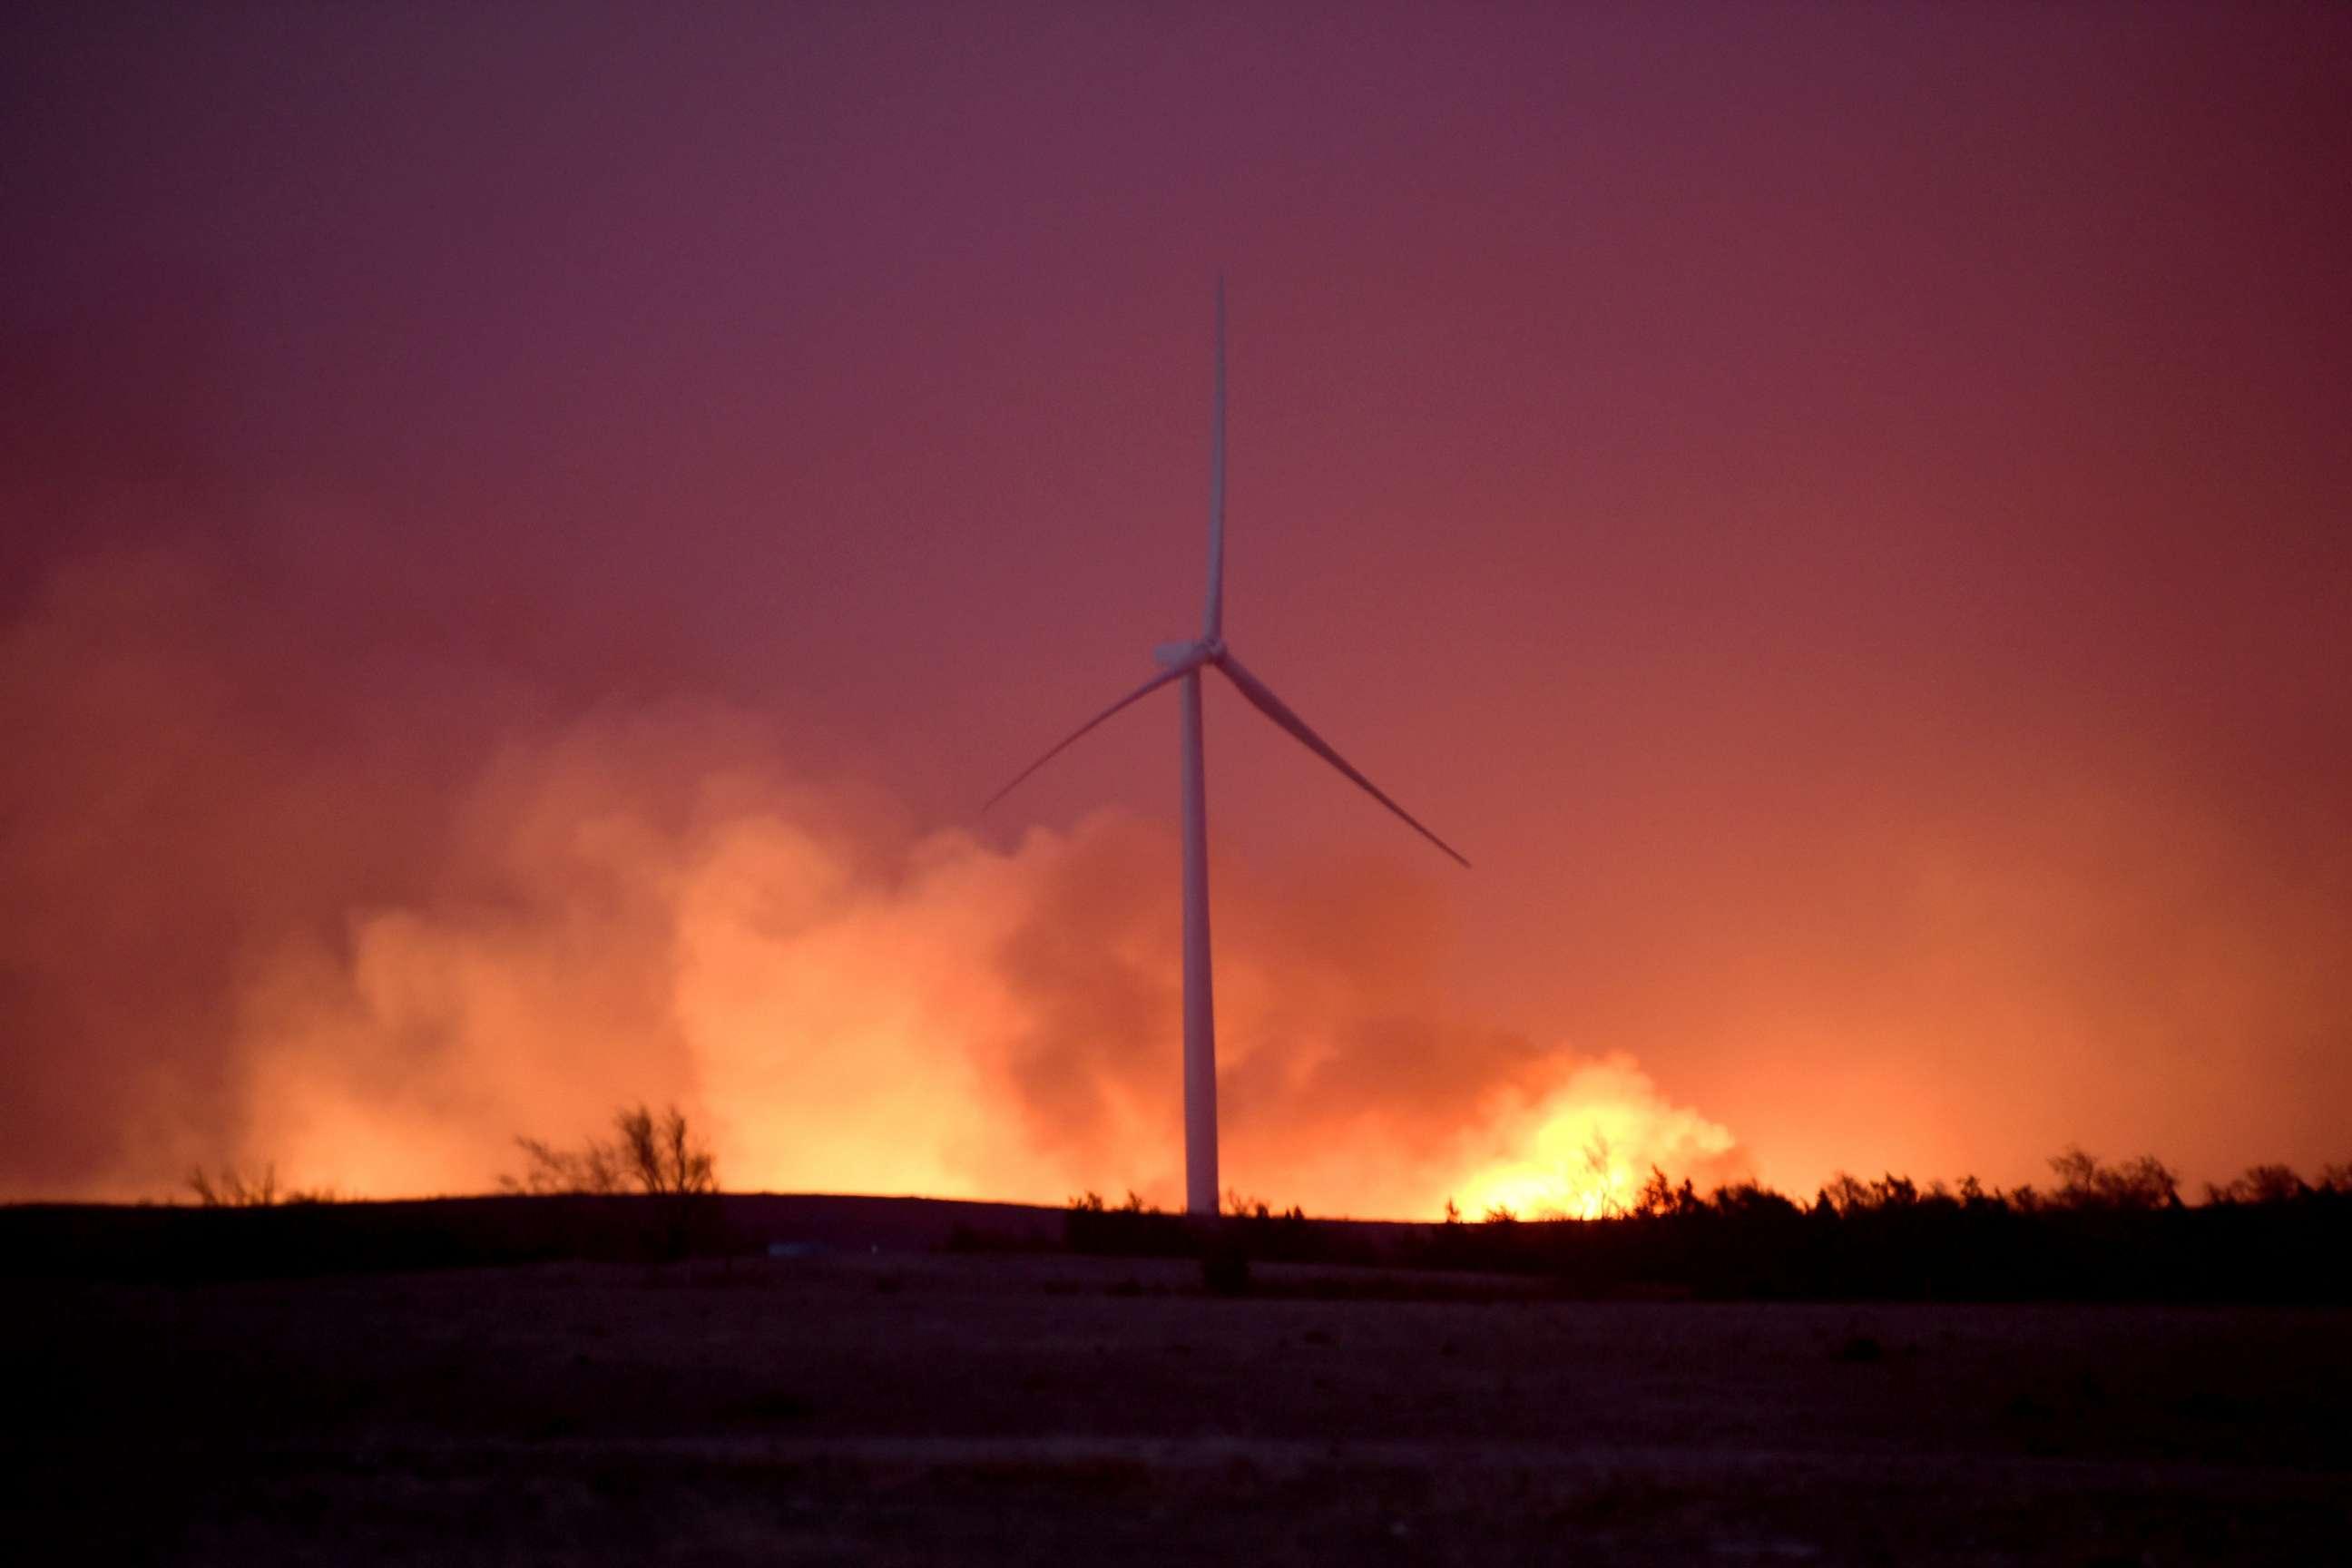 PHOTO: The Rhea fire rages behind a wind farm near Seiling, Oklahoma, April 17, 2018.